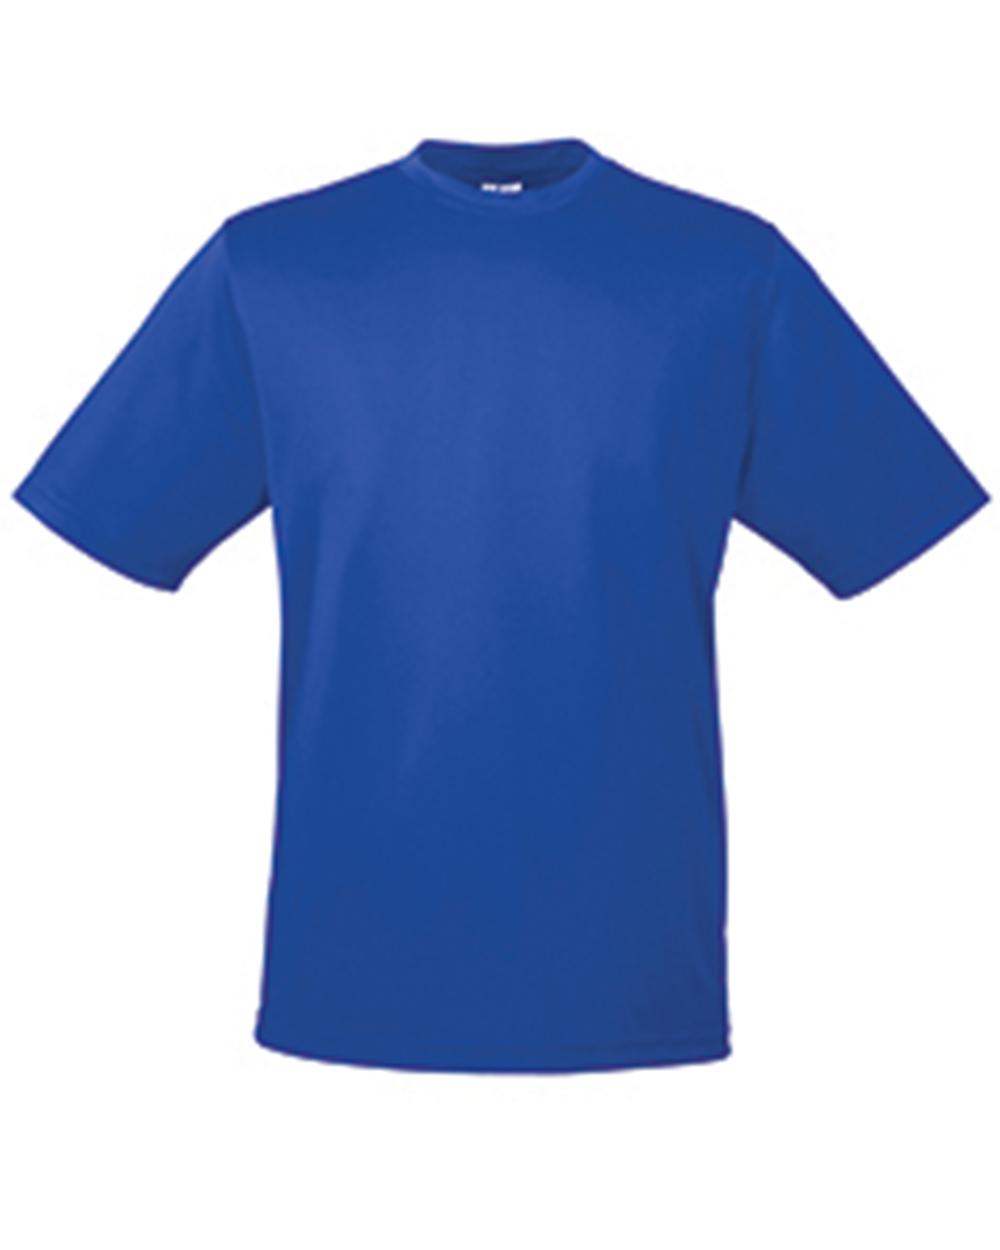 Zone Performance T-Shirt